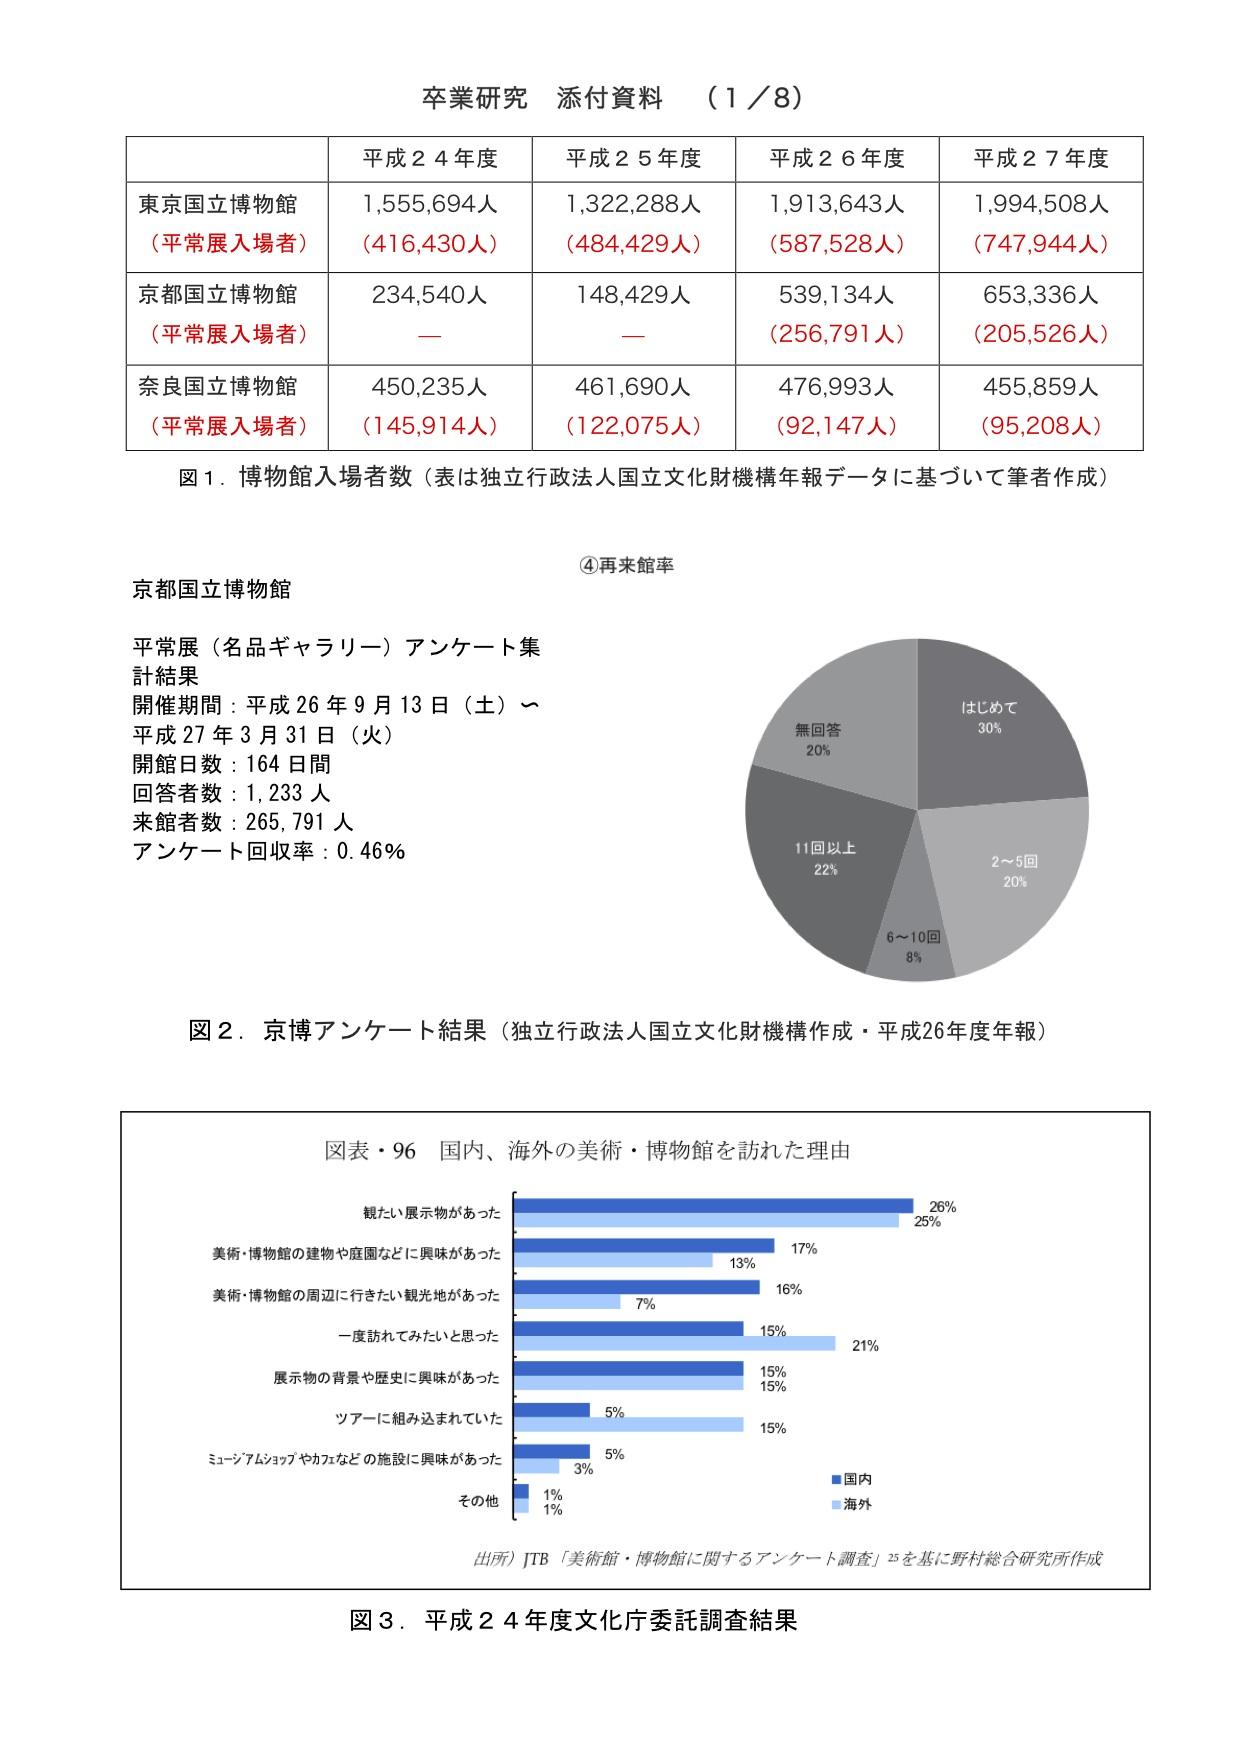 %e5%8d%92%e6%a5%ad%e7%a0%94%e7%a9%b6%e3%83%bb%e6%b7%bb%e4%bb%98%e8%b3%87%e6%96%991-8